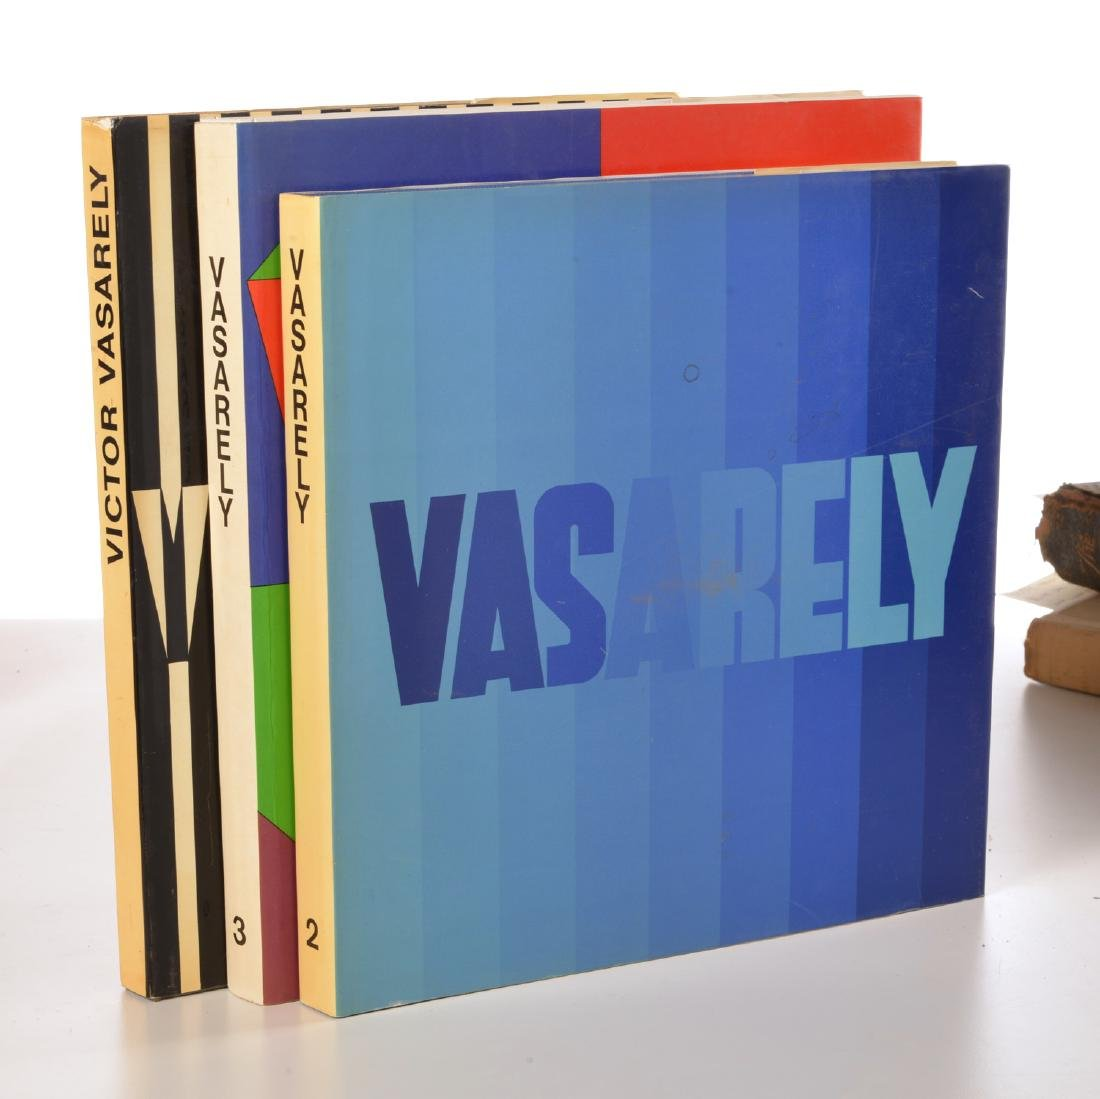 BOOKS: (3) Vols Victor Vasarely, 1969